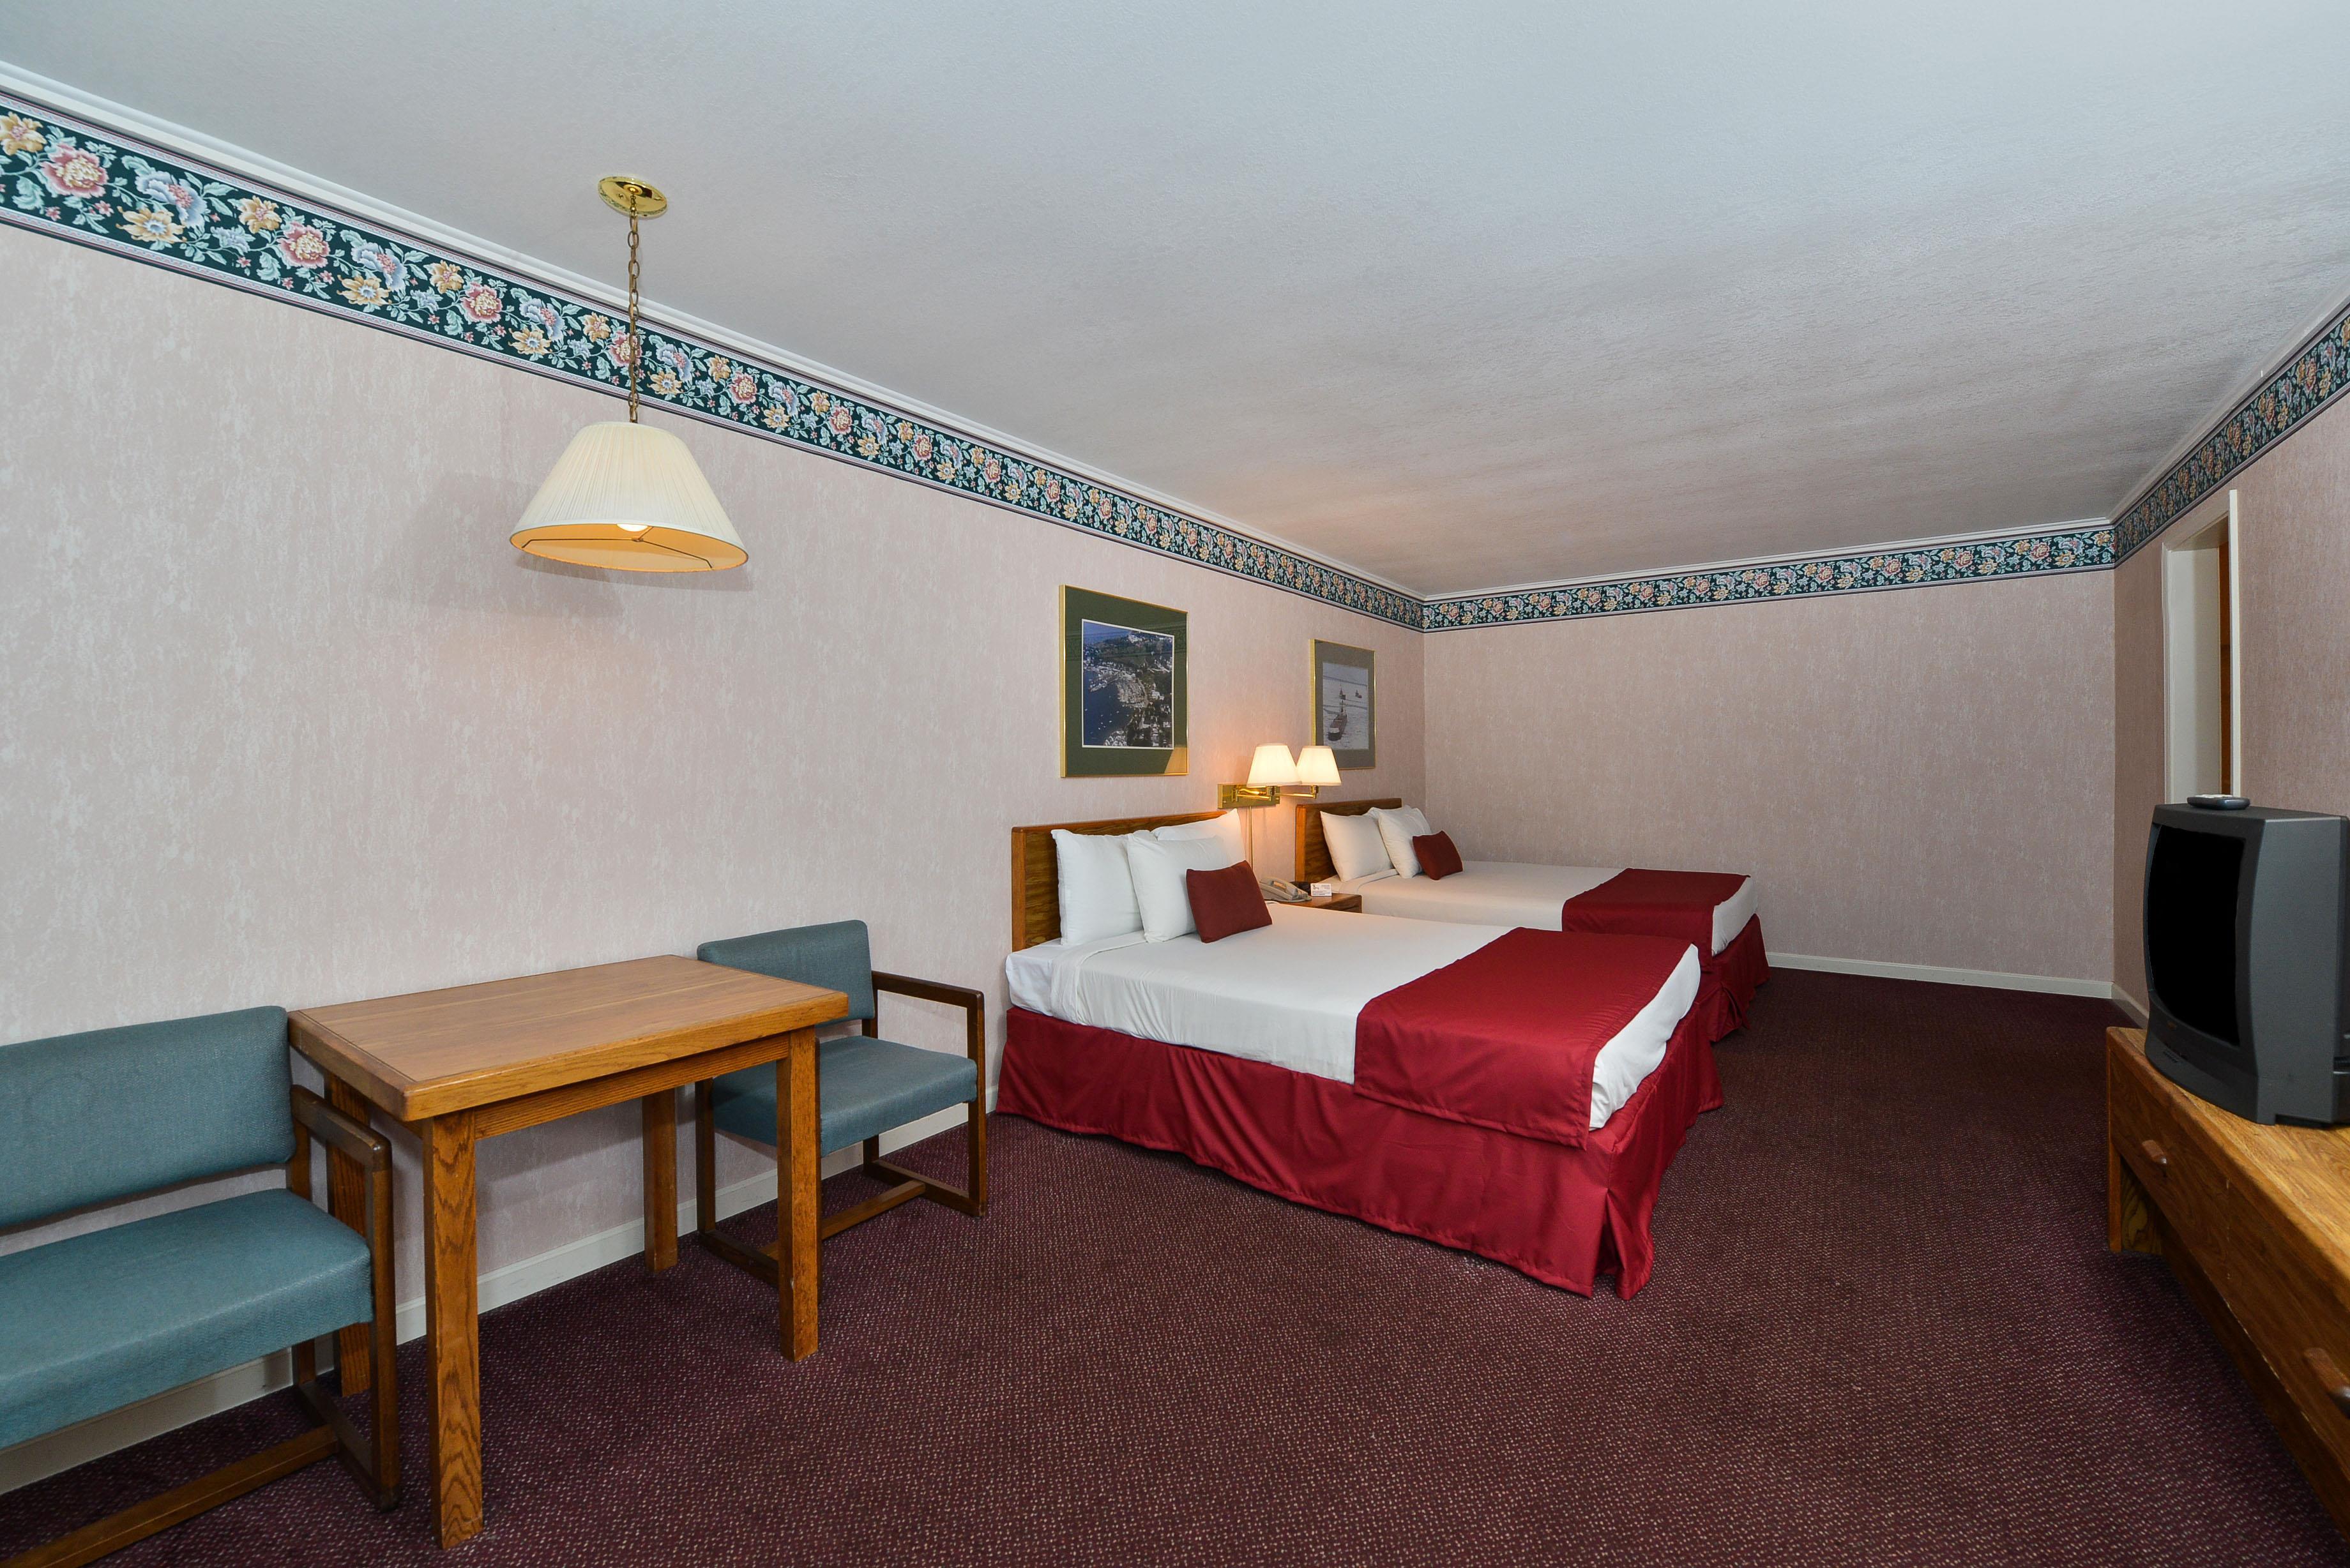 Bed And Breakfast Near Mackinaw City